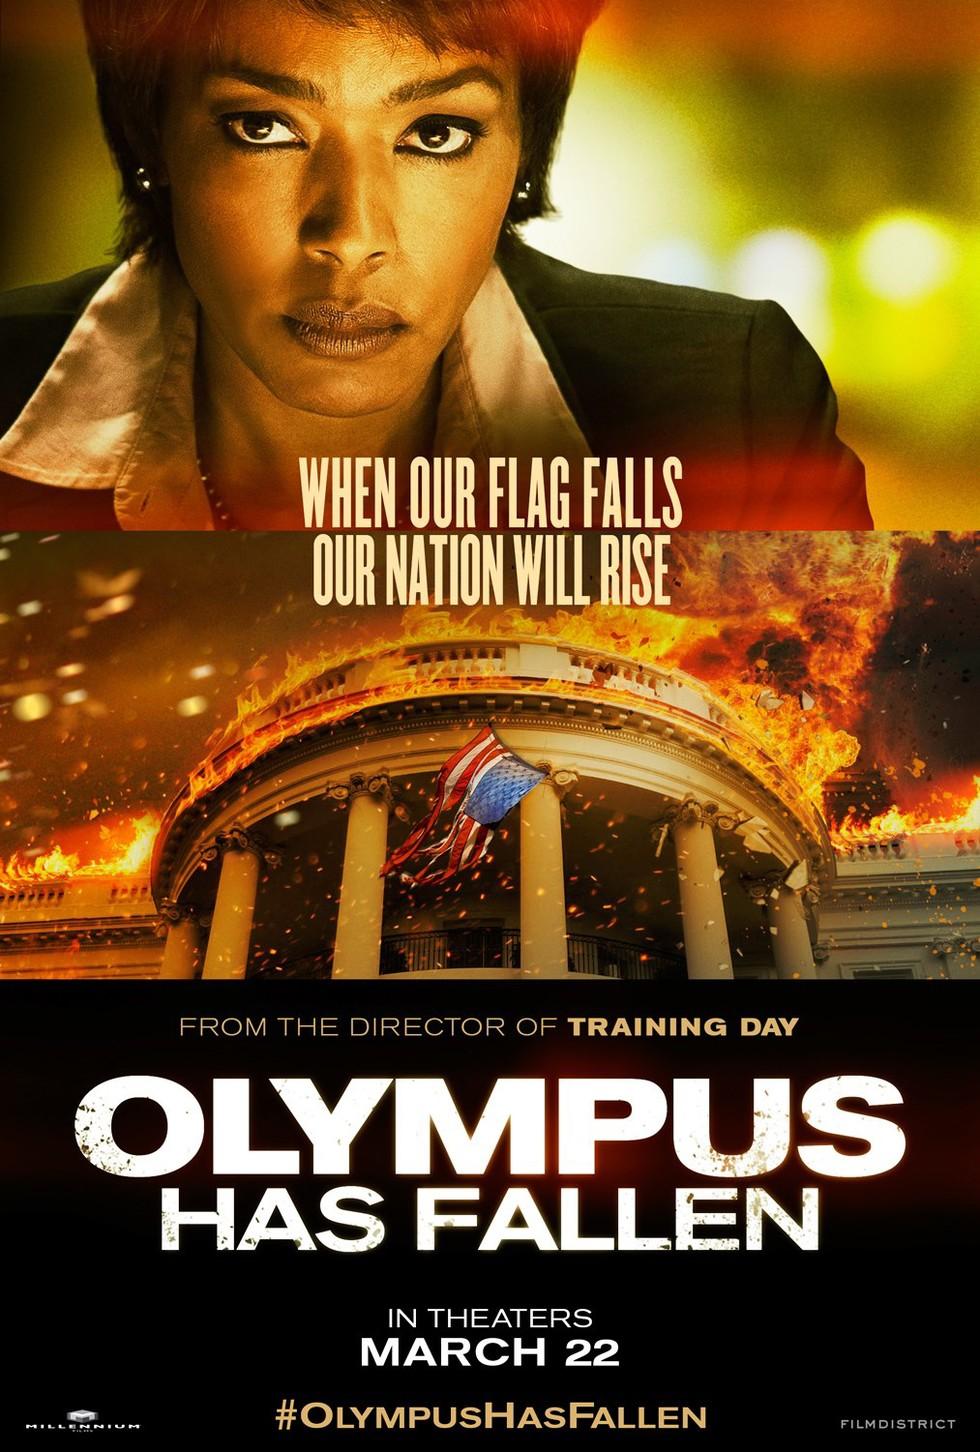 Olympus Has Fallen - Movie Poster #4 (Large)